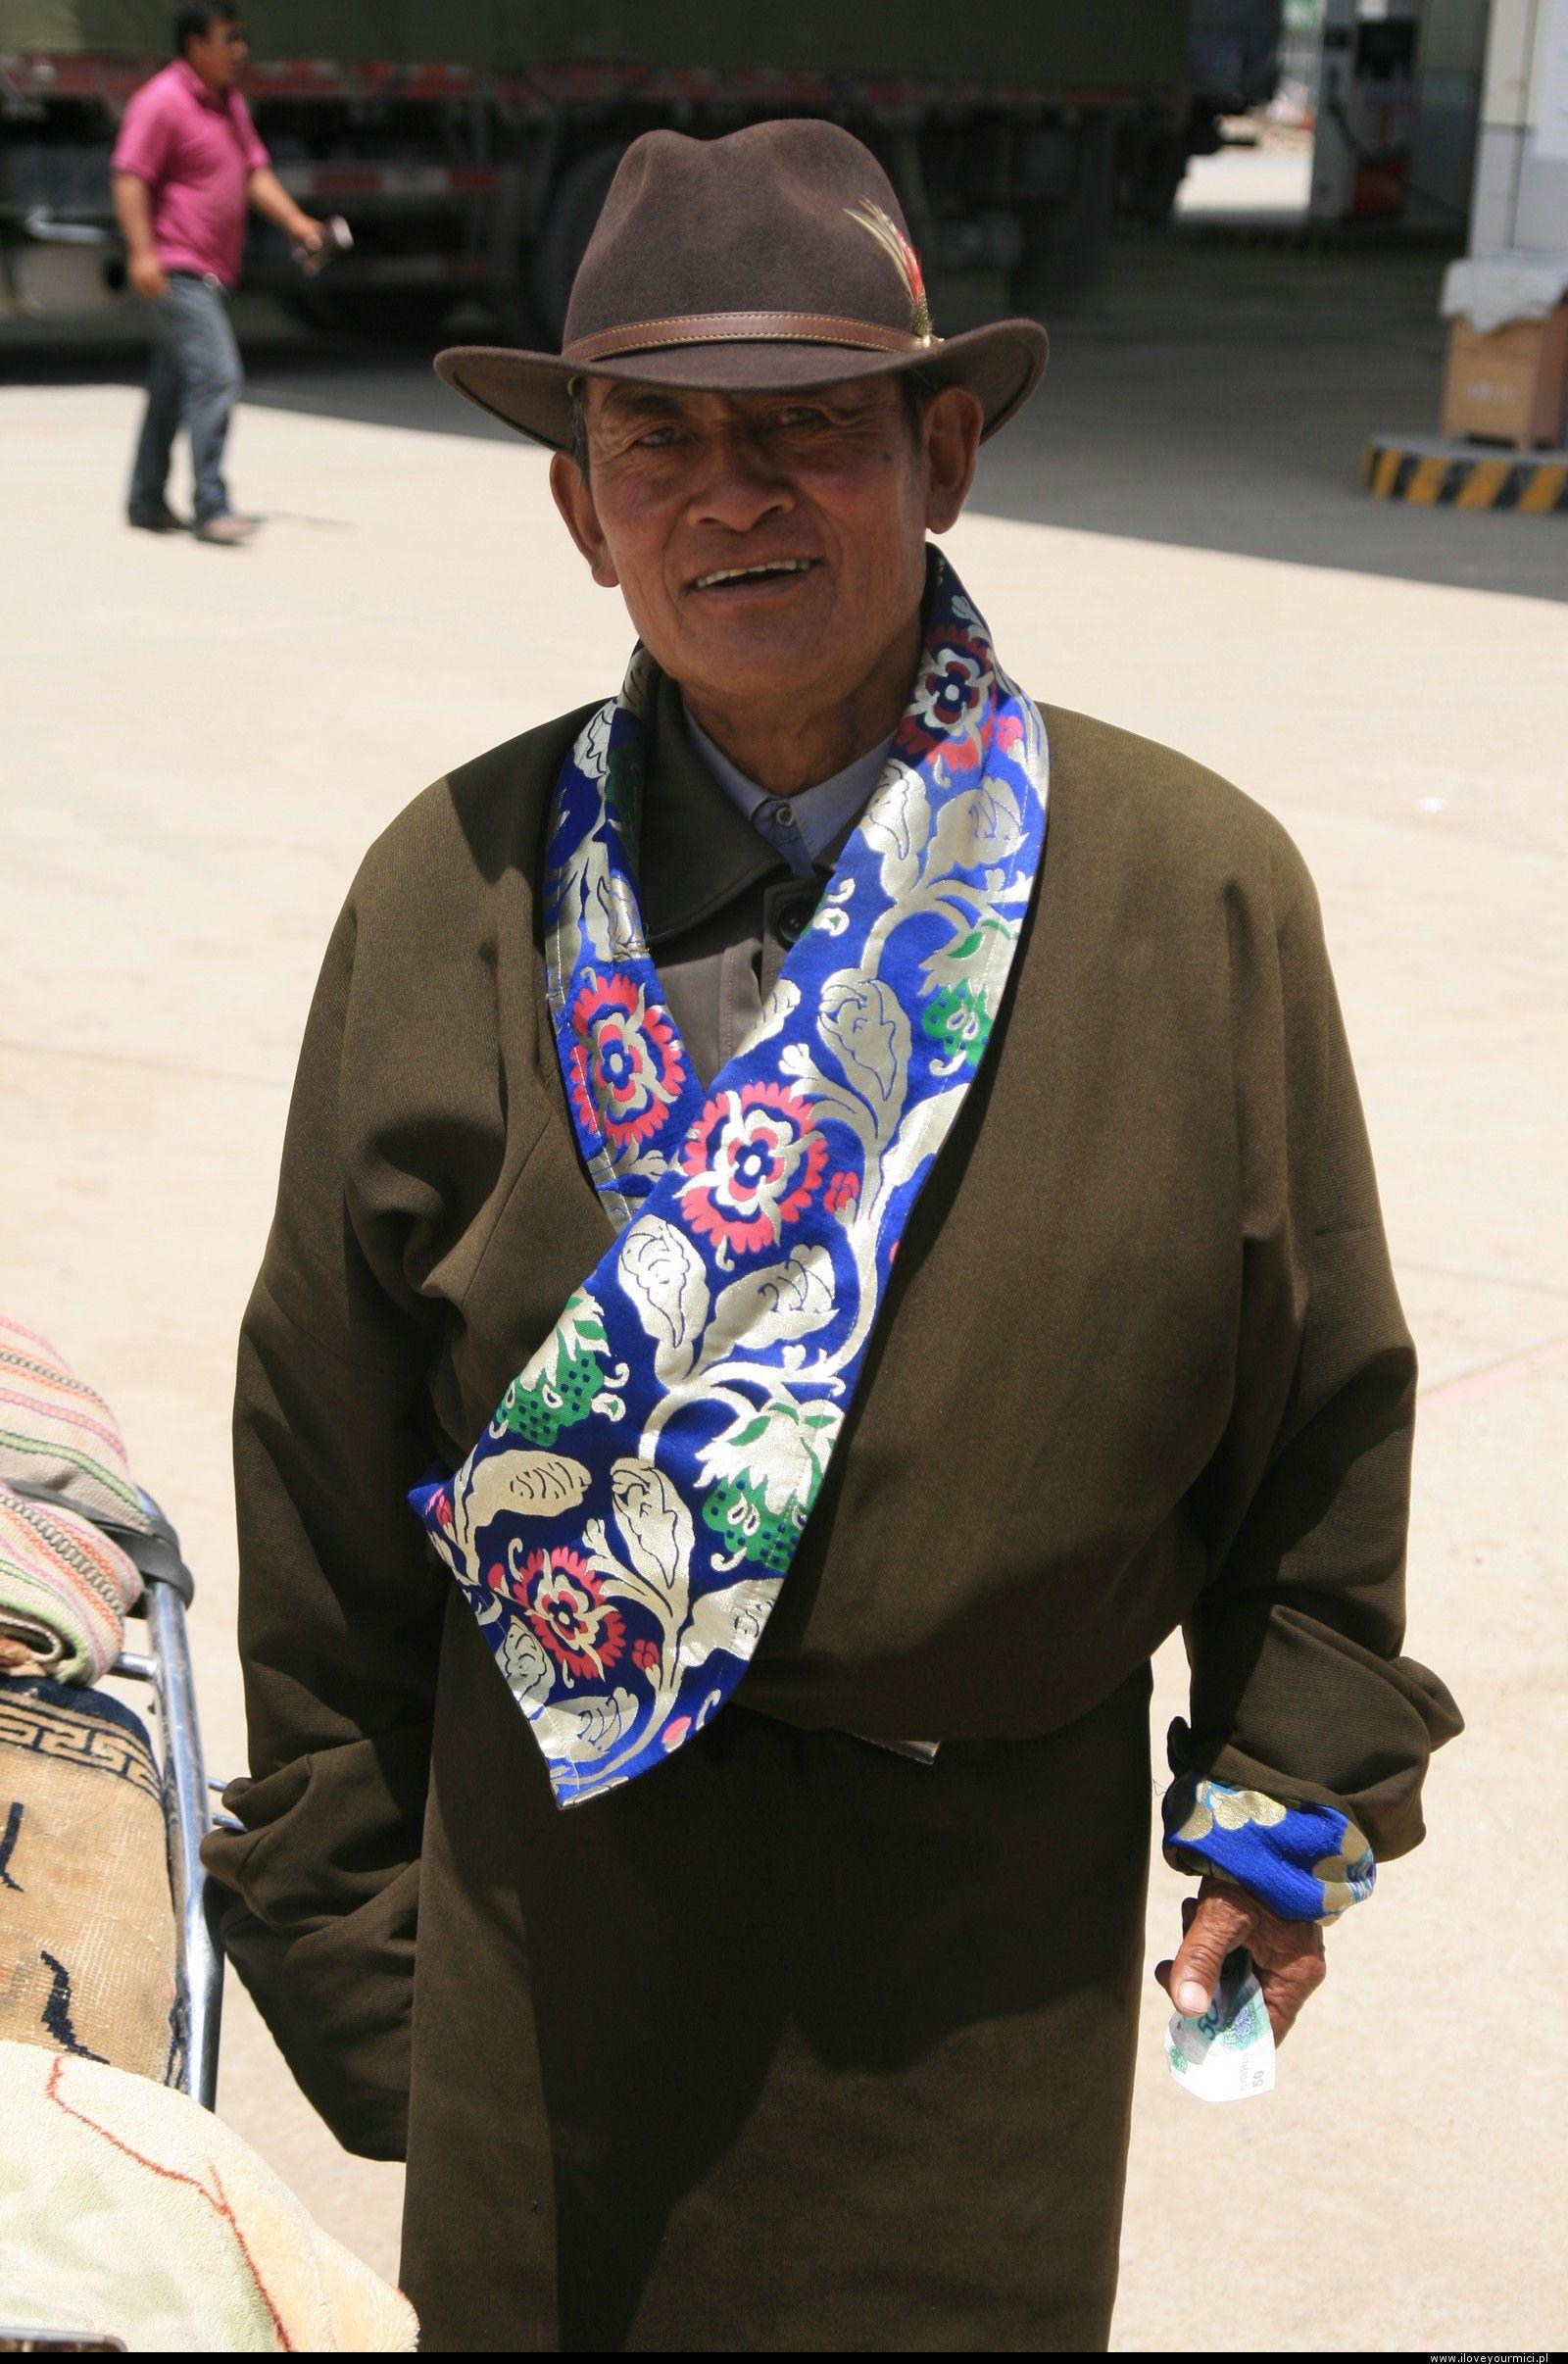 qinghai china chinski zwiad iloveyourmici